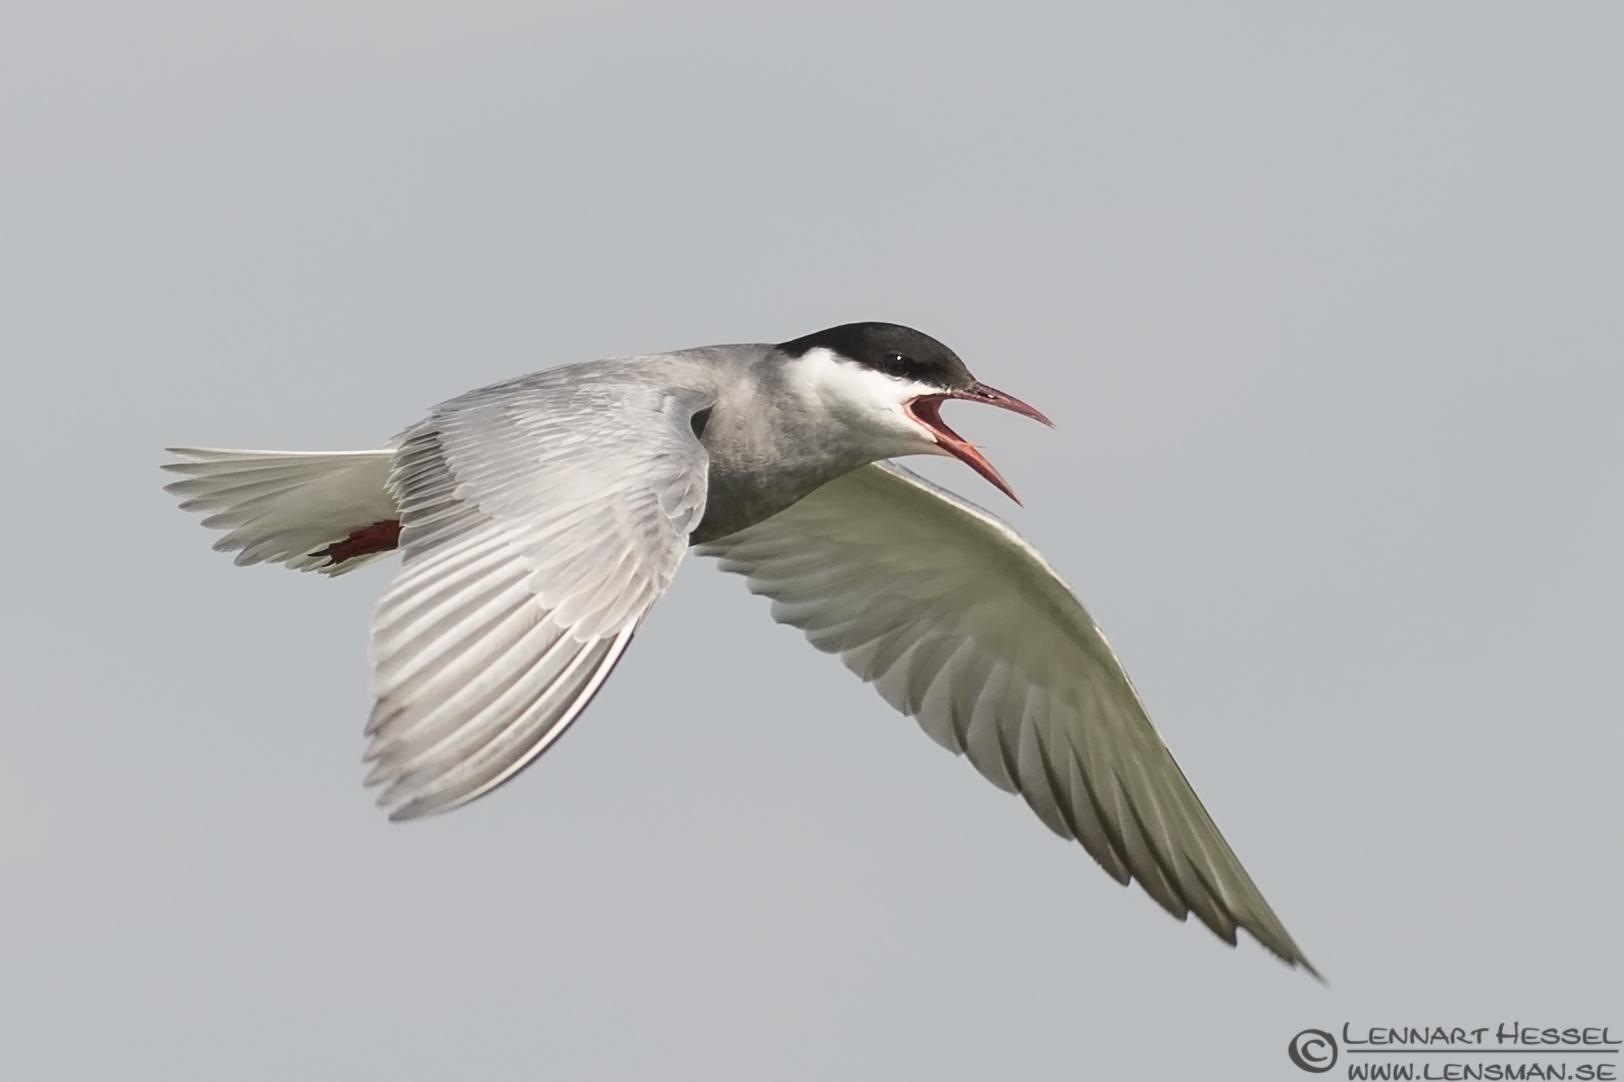 Whiskered Tern calling